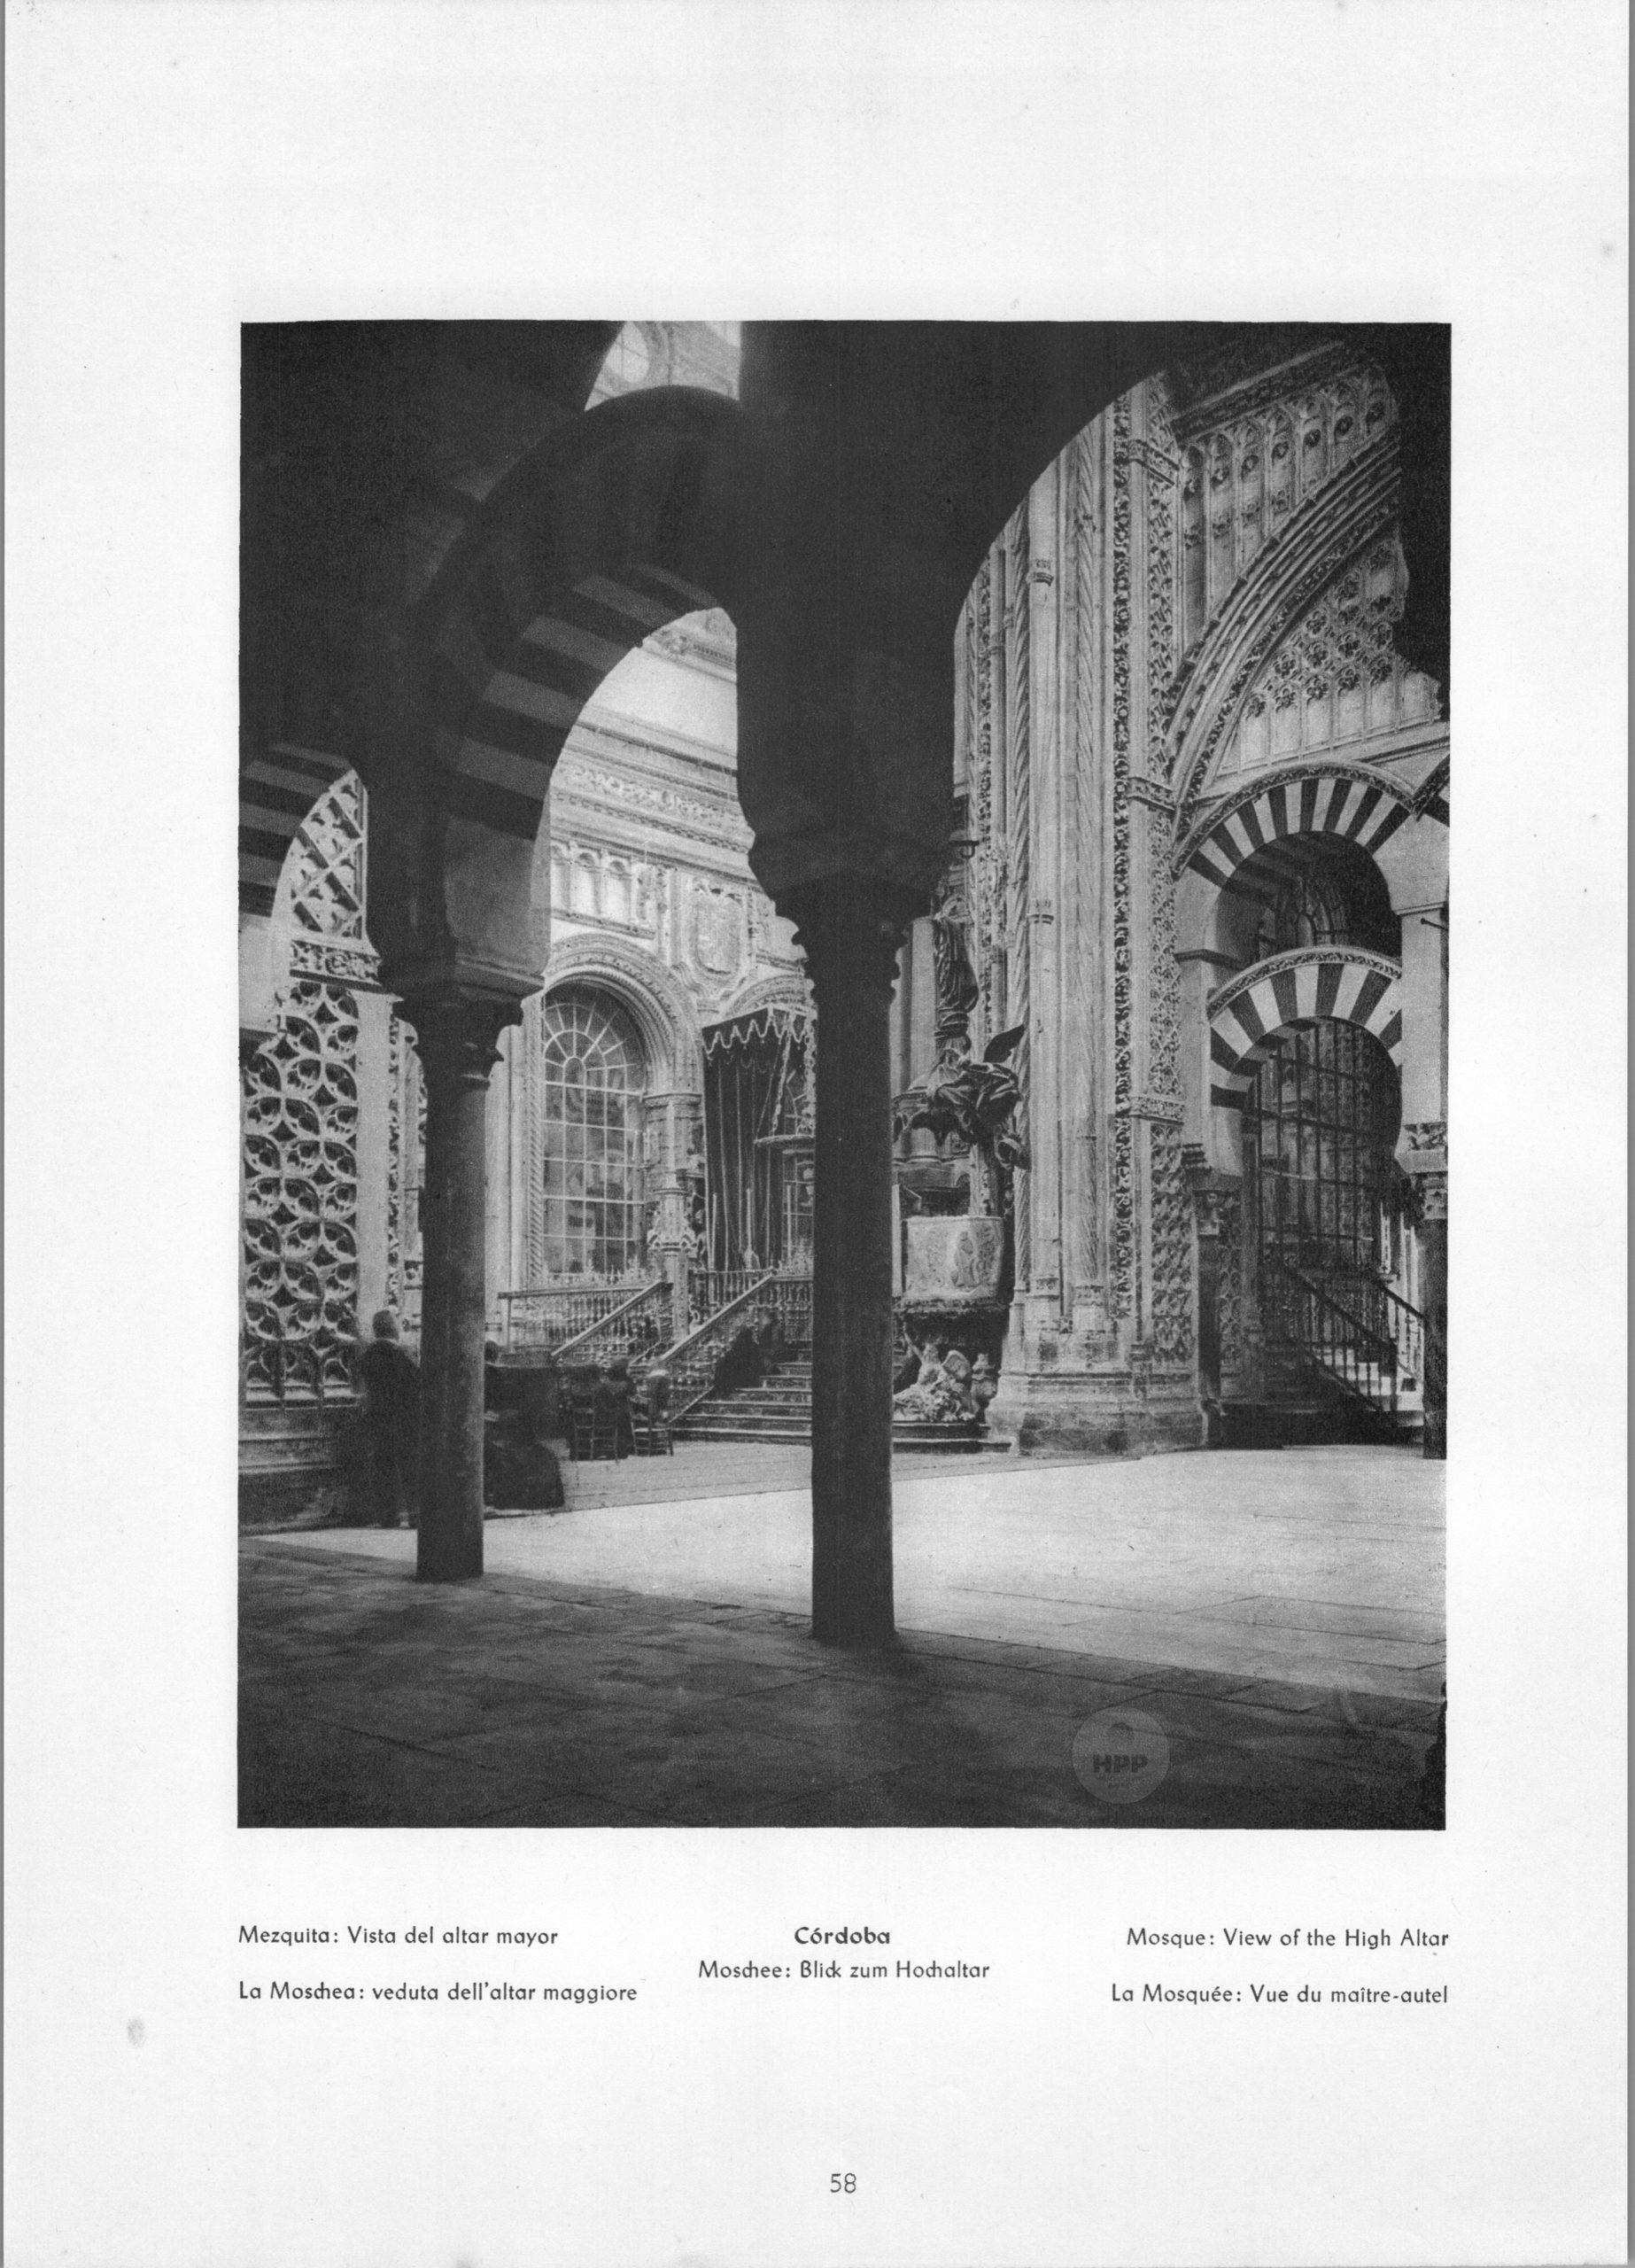 Córdoba Mosque - Mosque: View of the High Altar